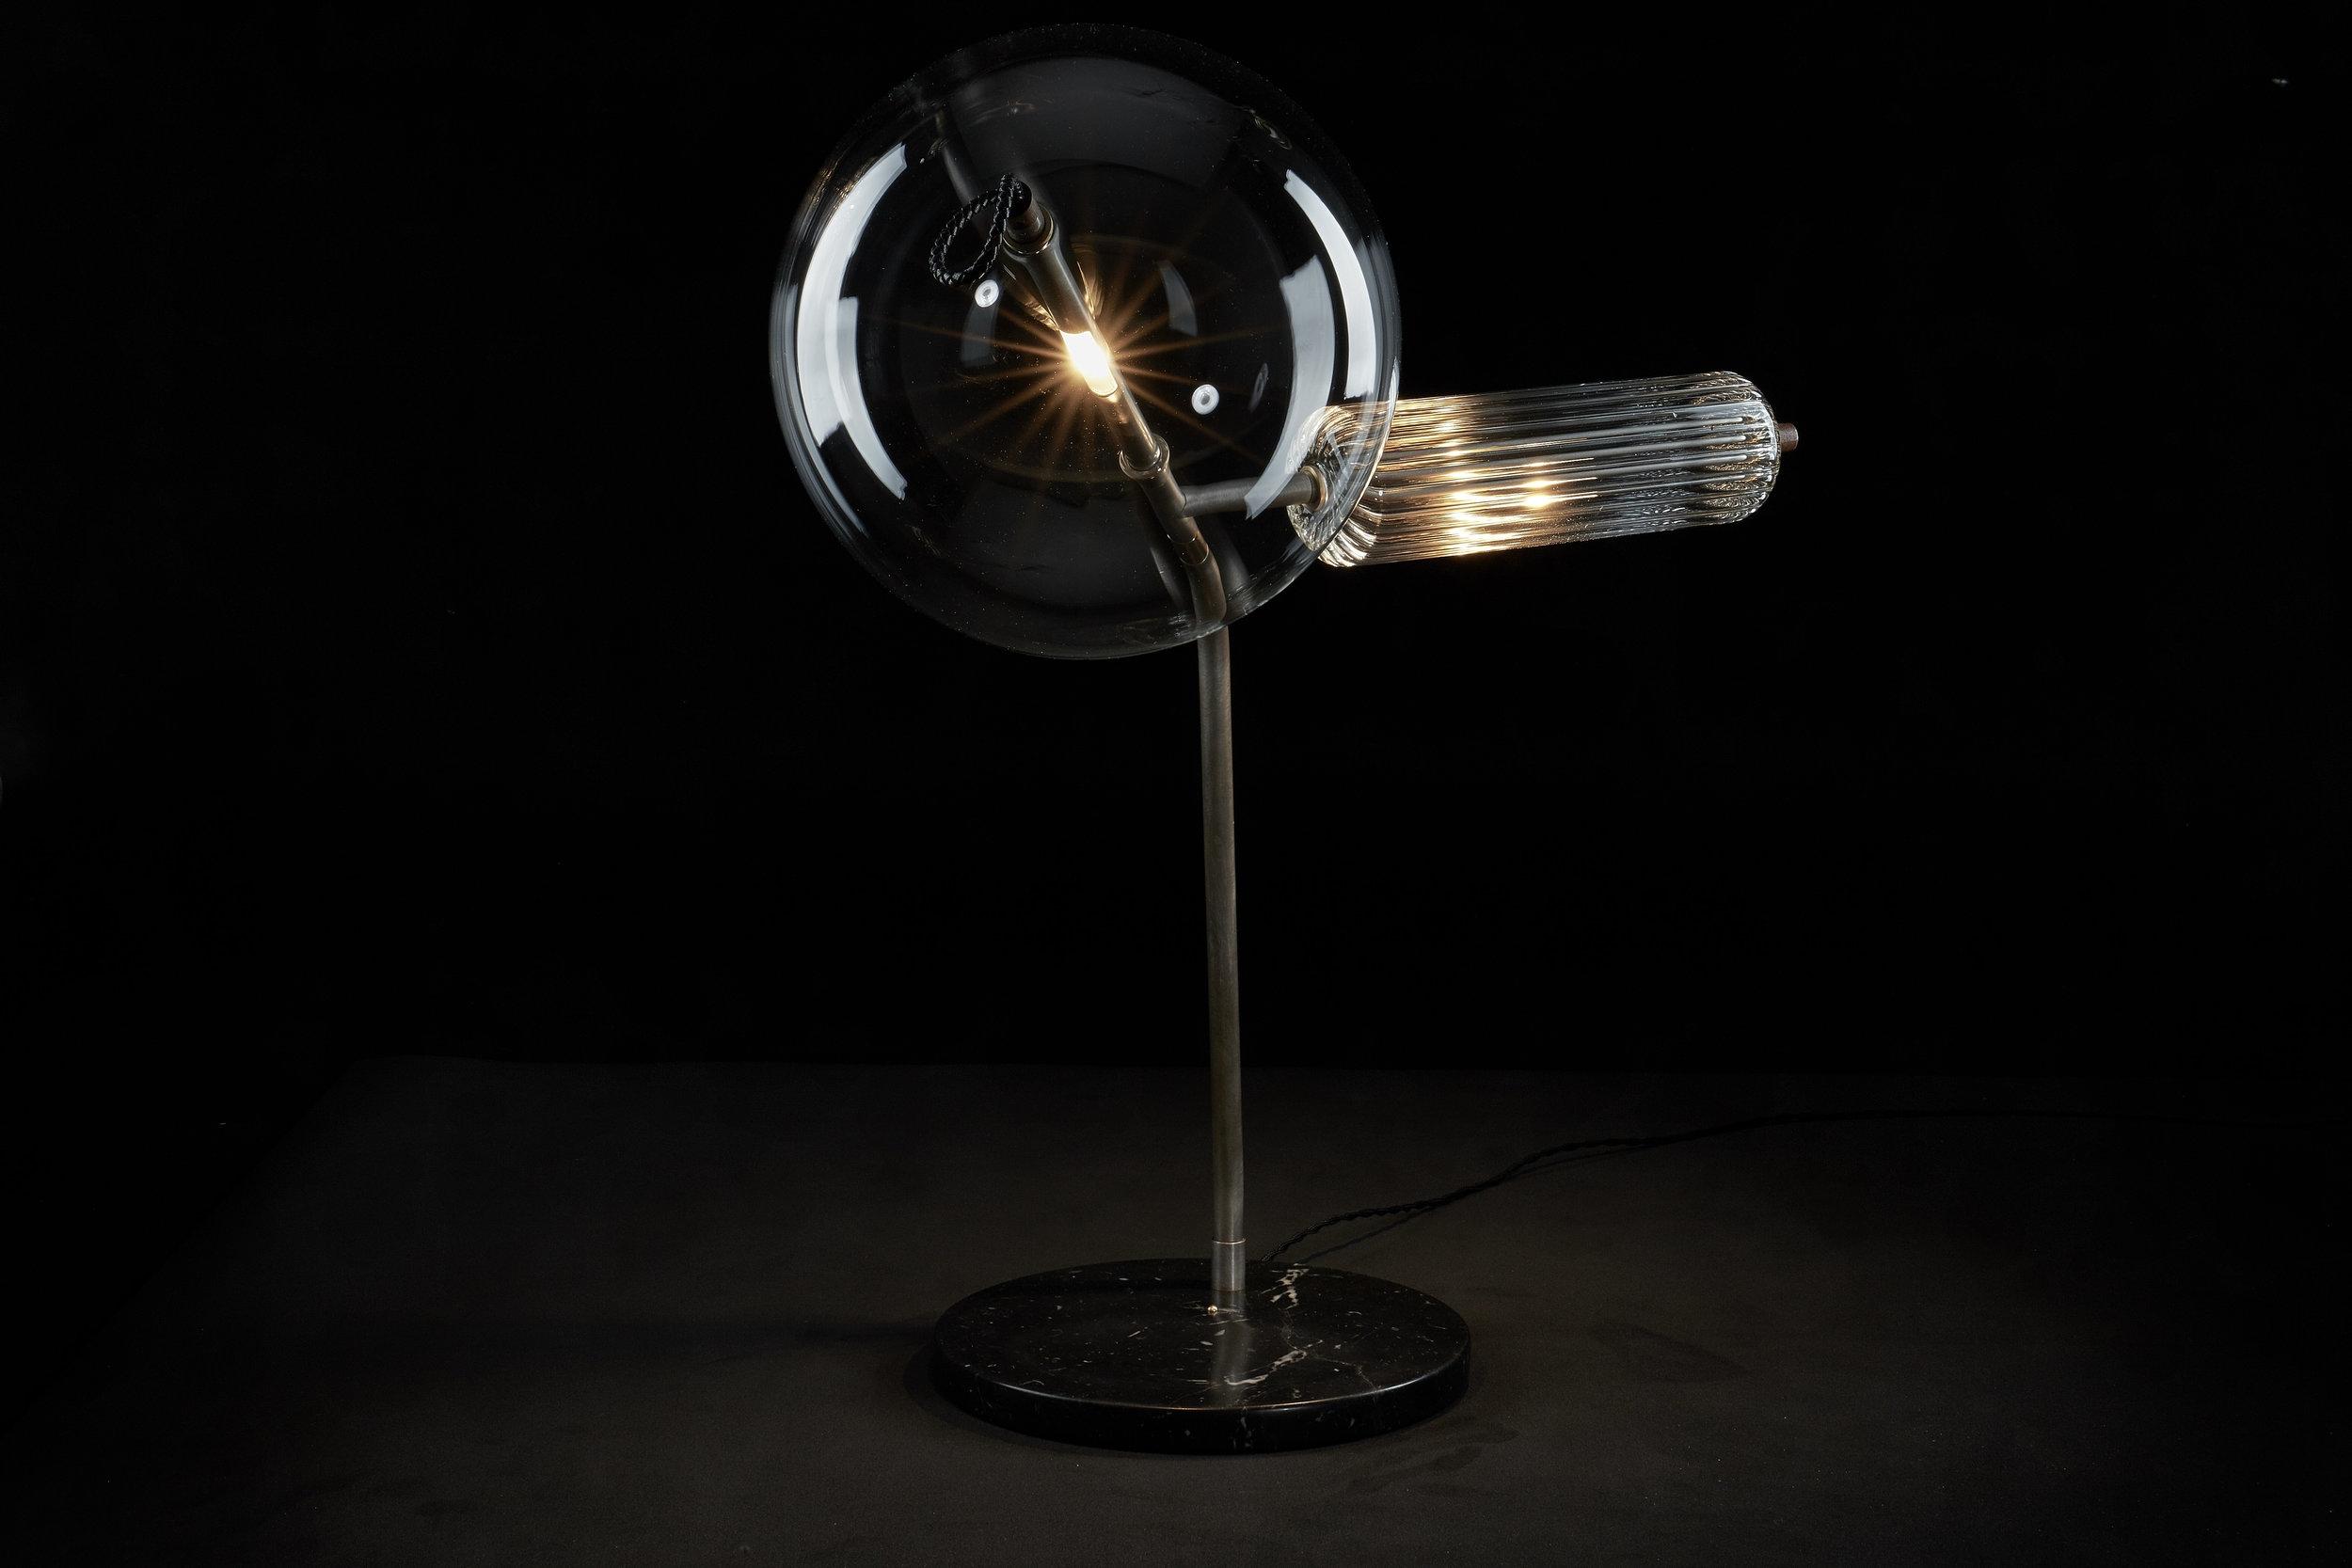 T-Double Silver Table Lamp by SIlvioMondinoStudio for Galerie SORS.